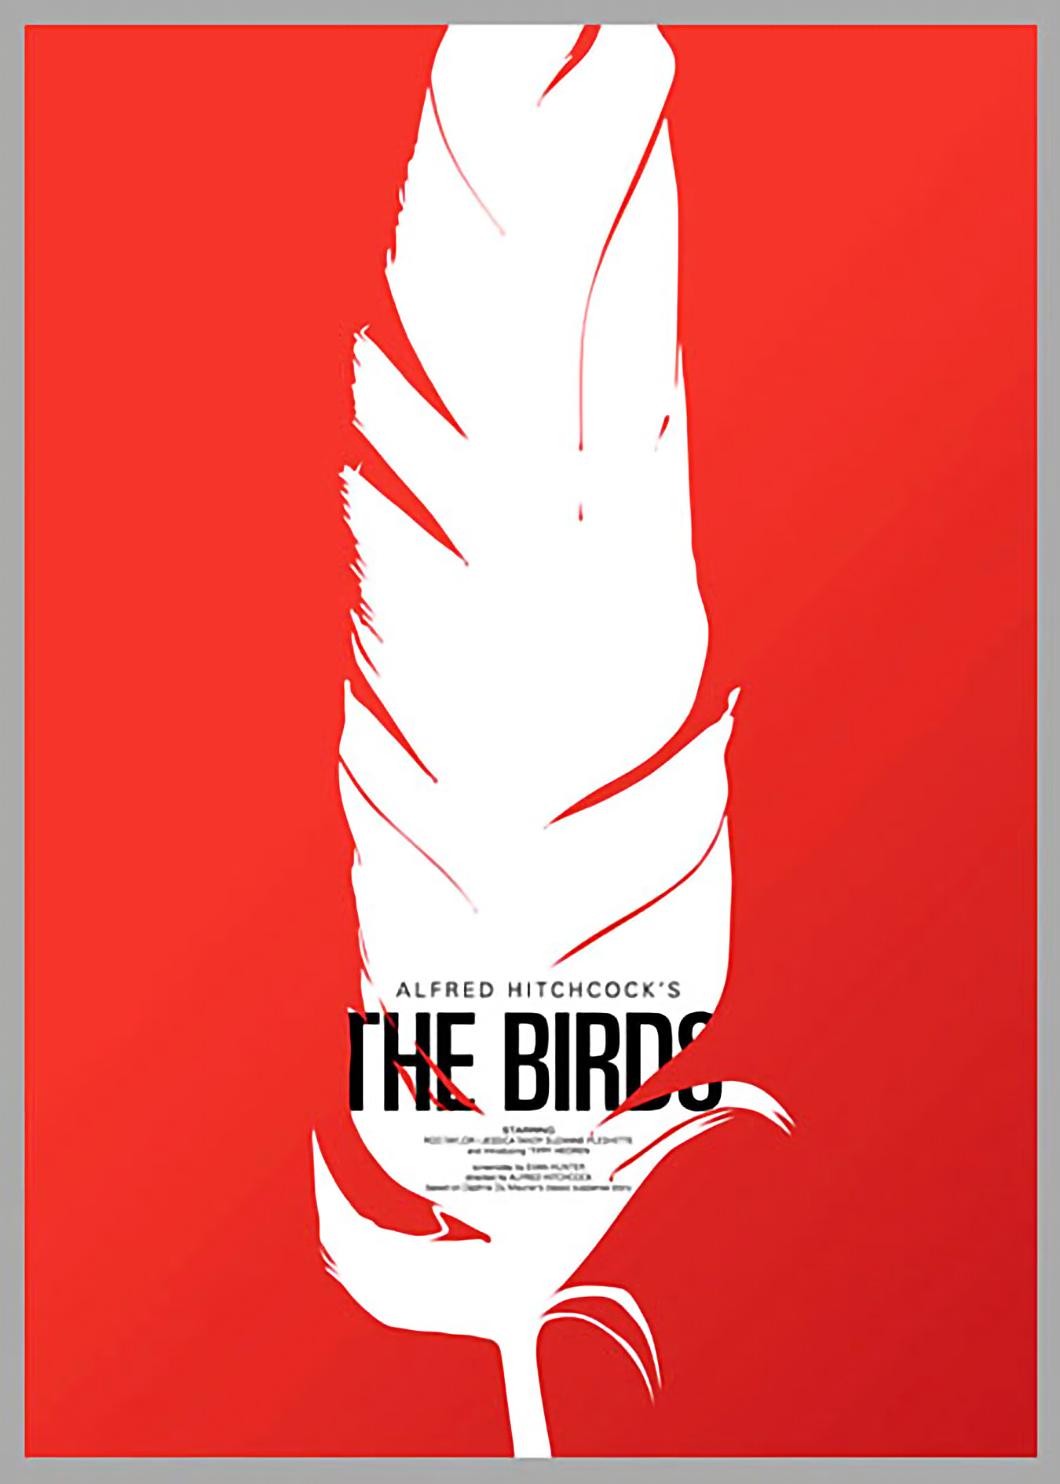 Hitchcock The Birds Series